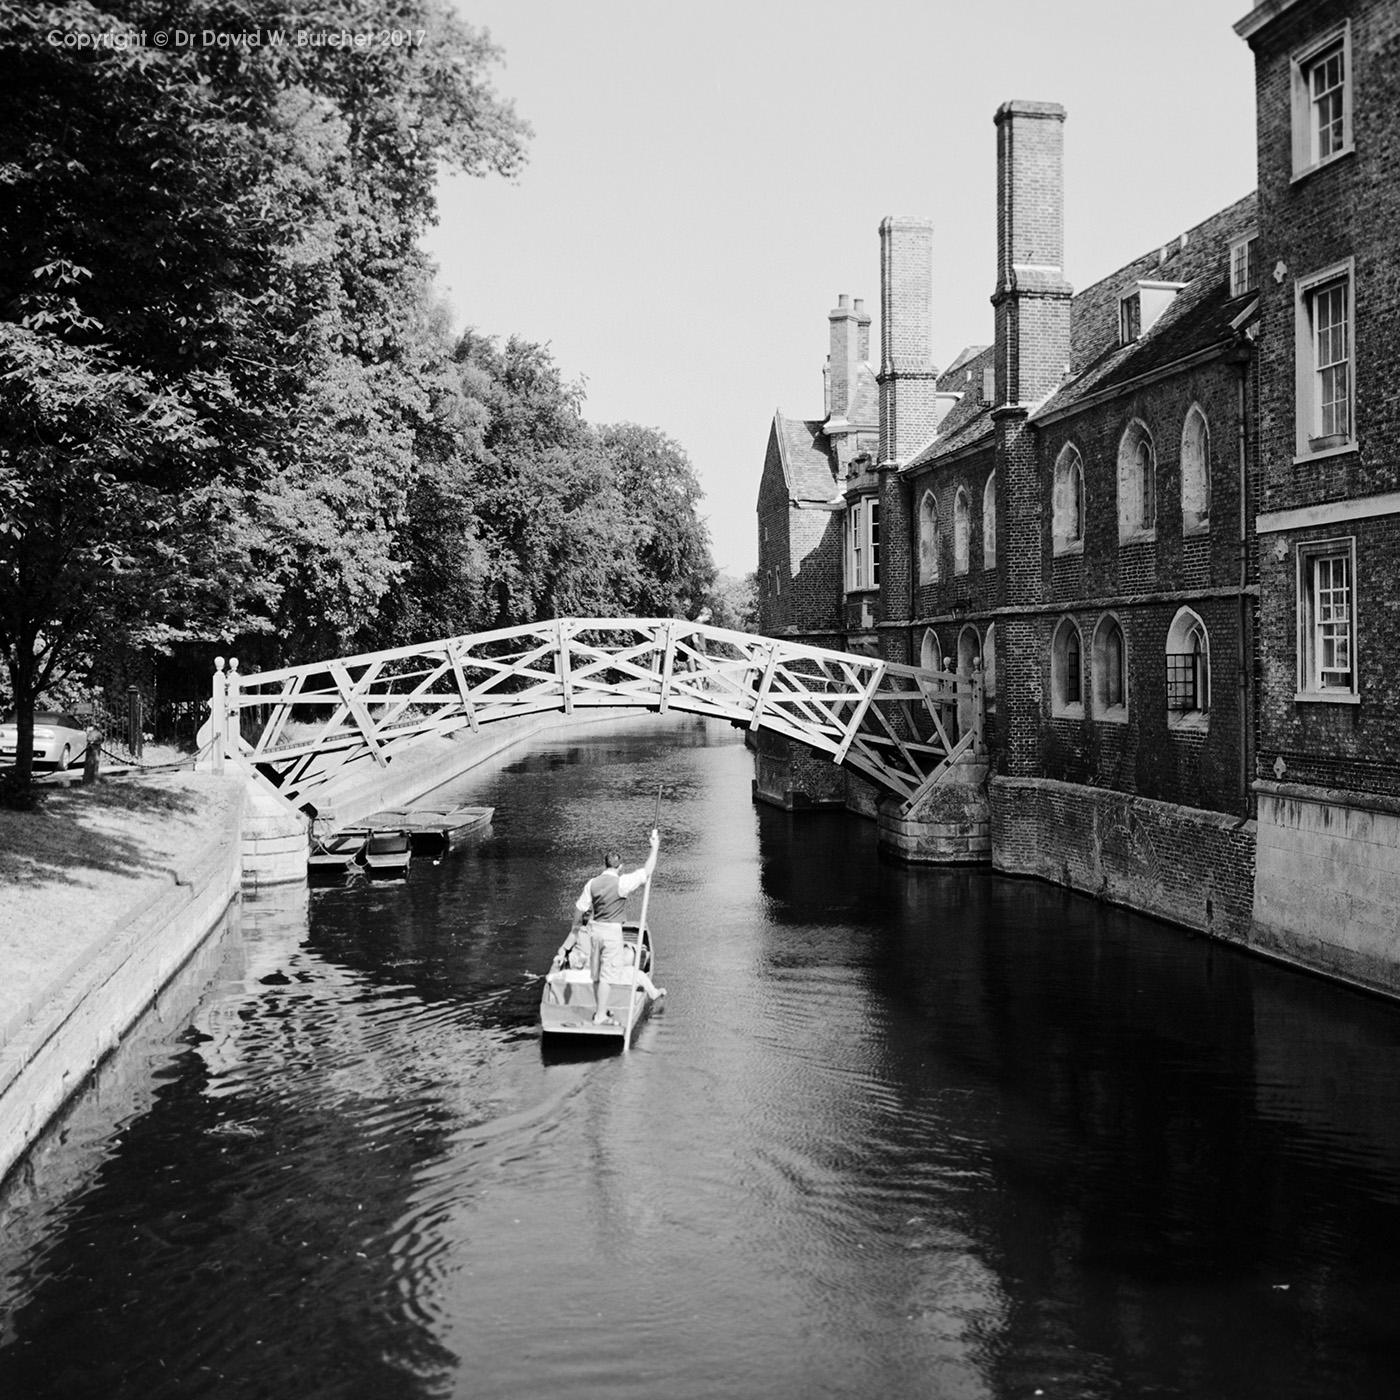 Cambridge Queens' College Mathematical Bridge and River Cam, England